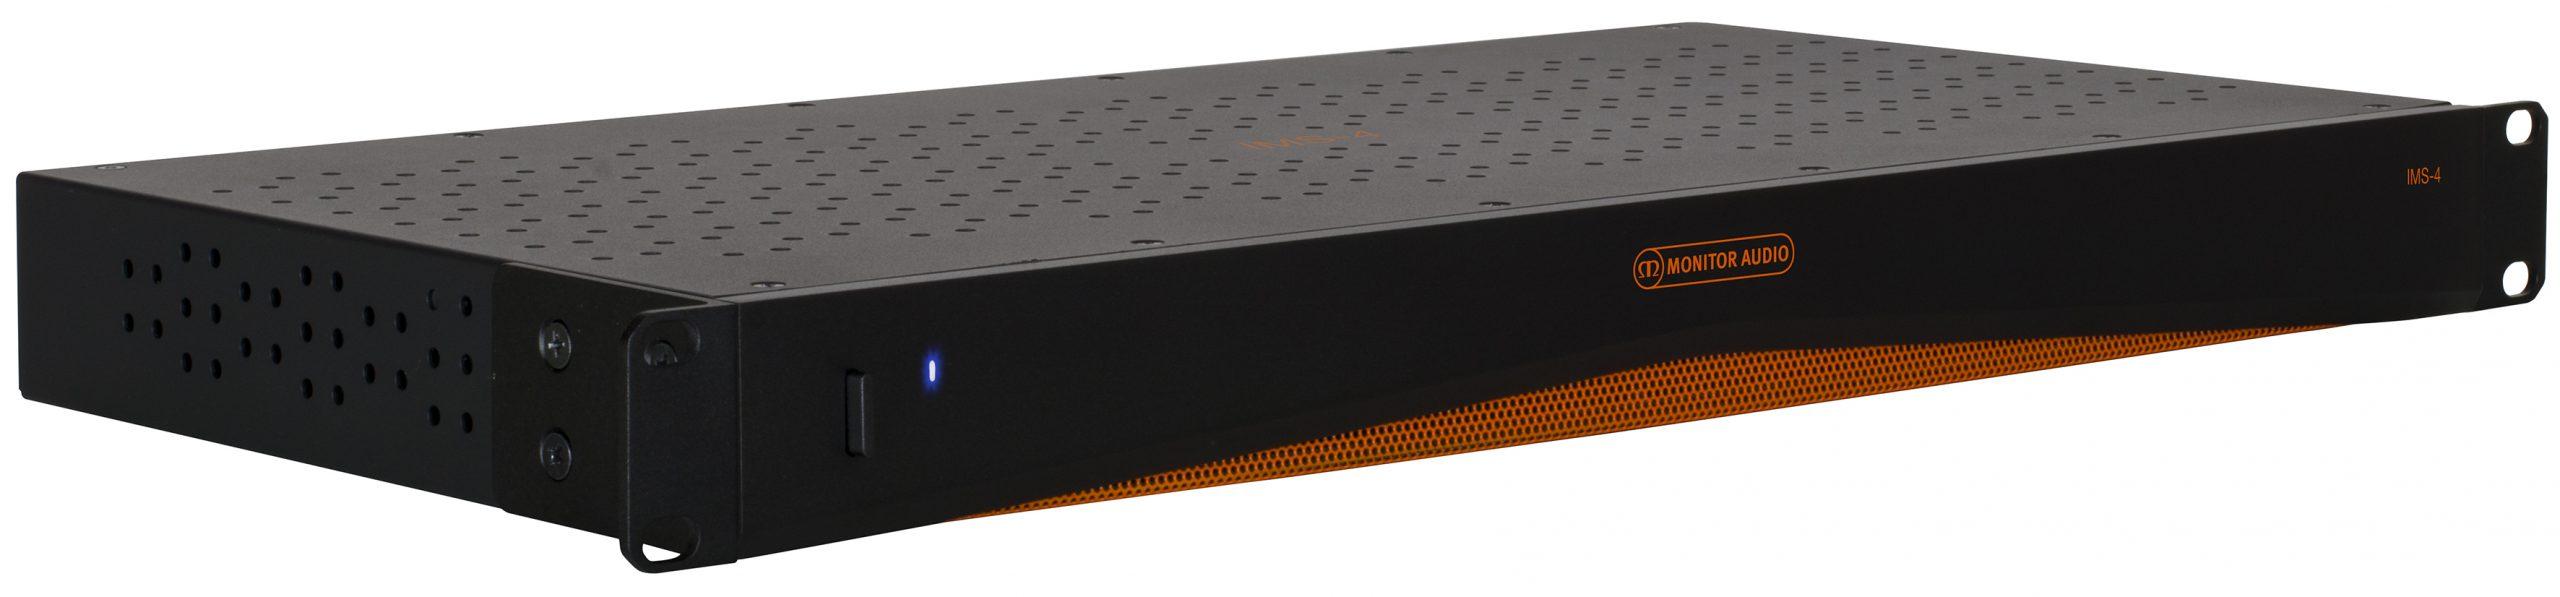 Monitor Audio Music Streamer